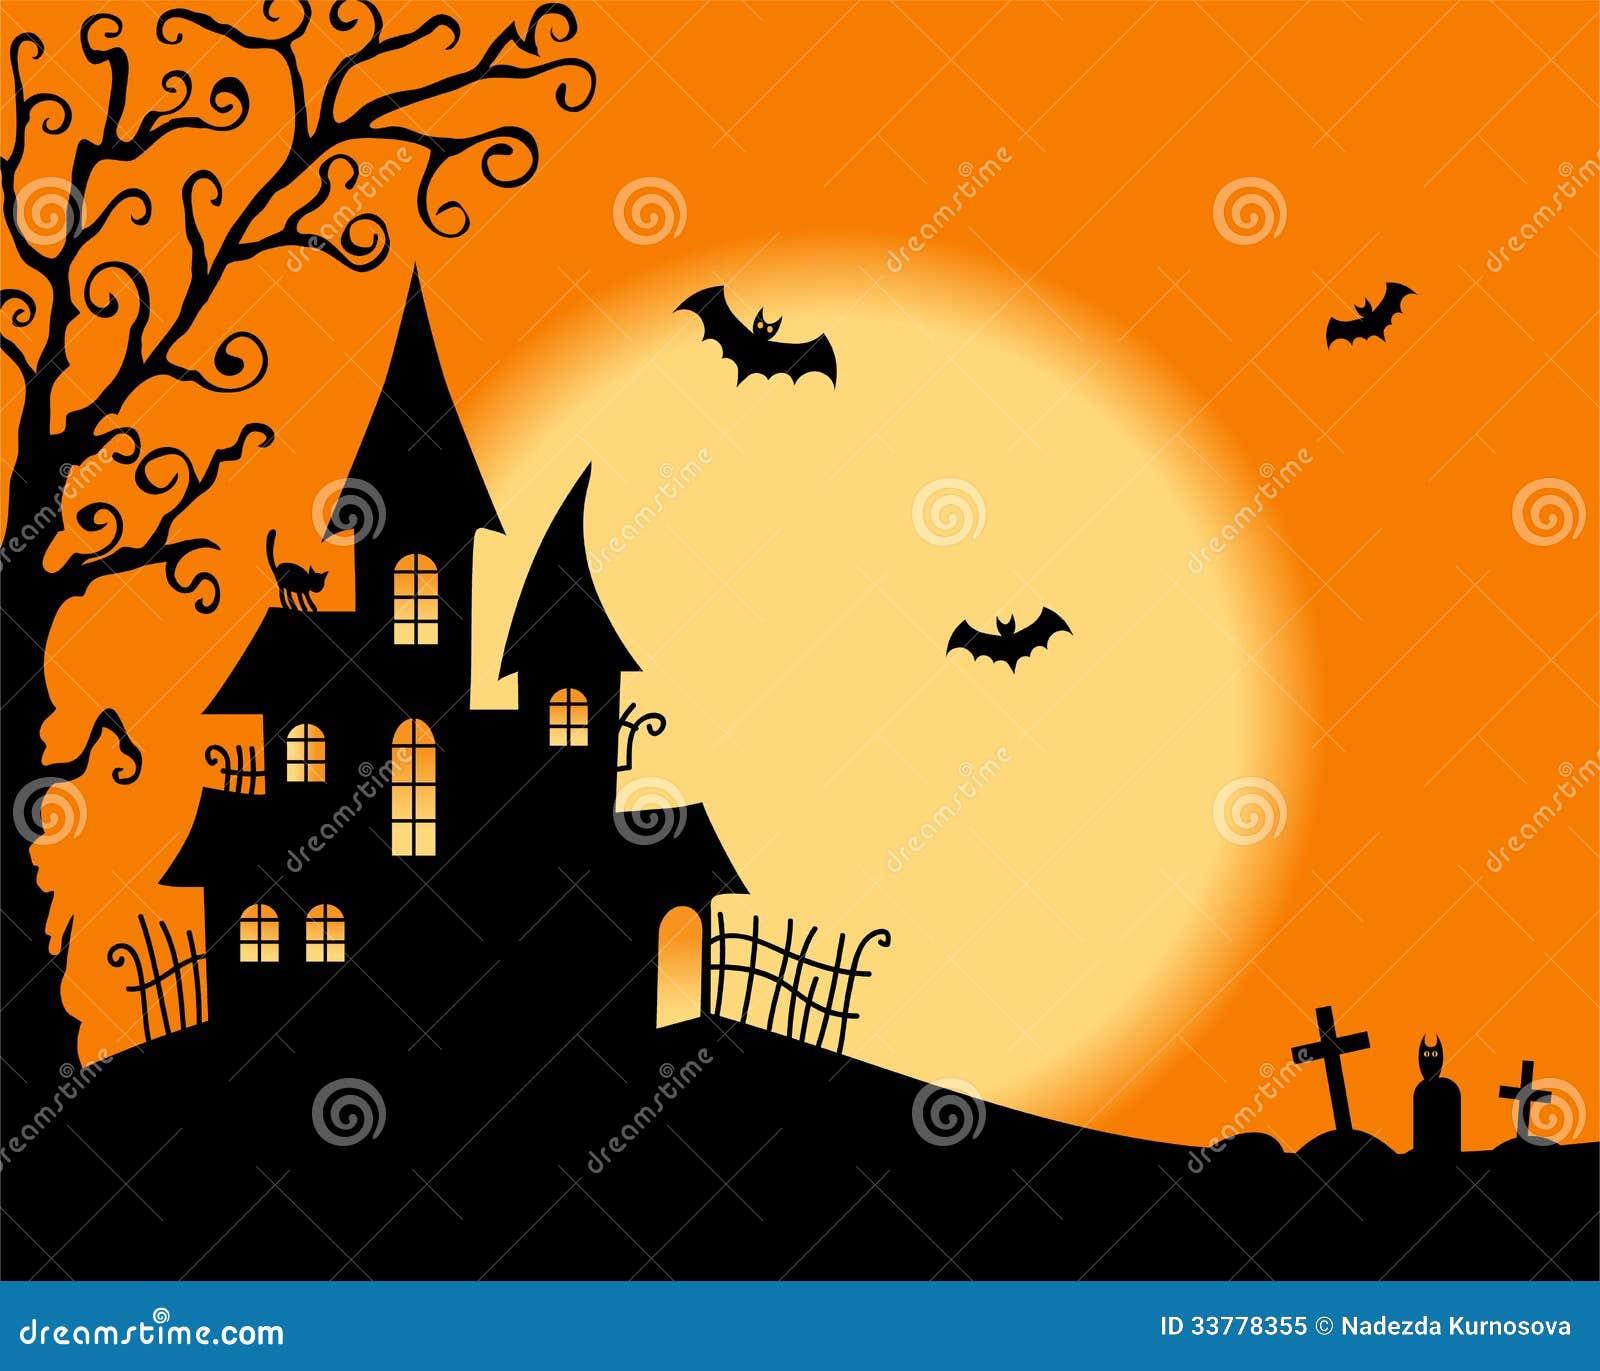 Halloween Vector Card Royalty Free Stock Photo - Image: 33778355